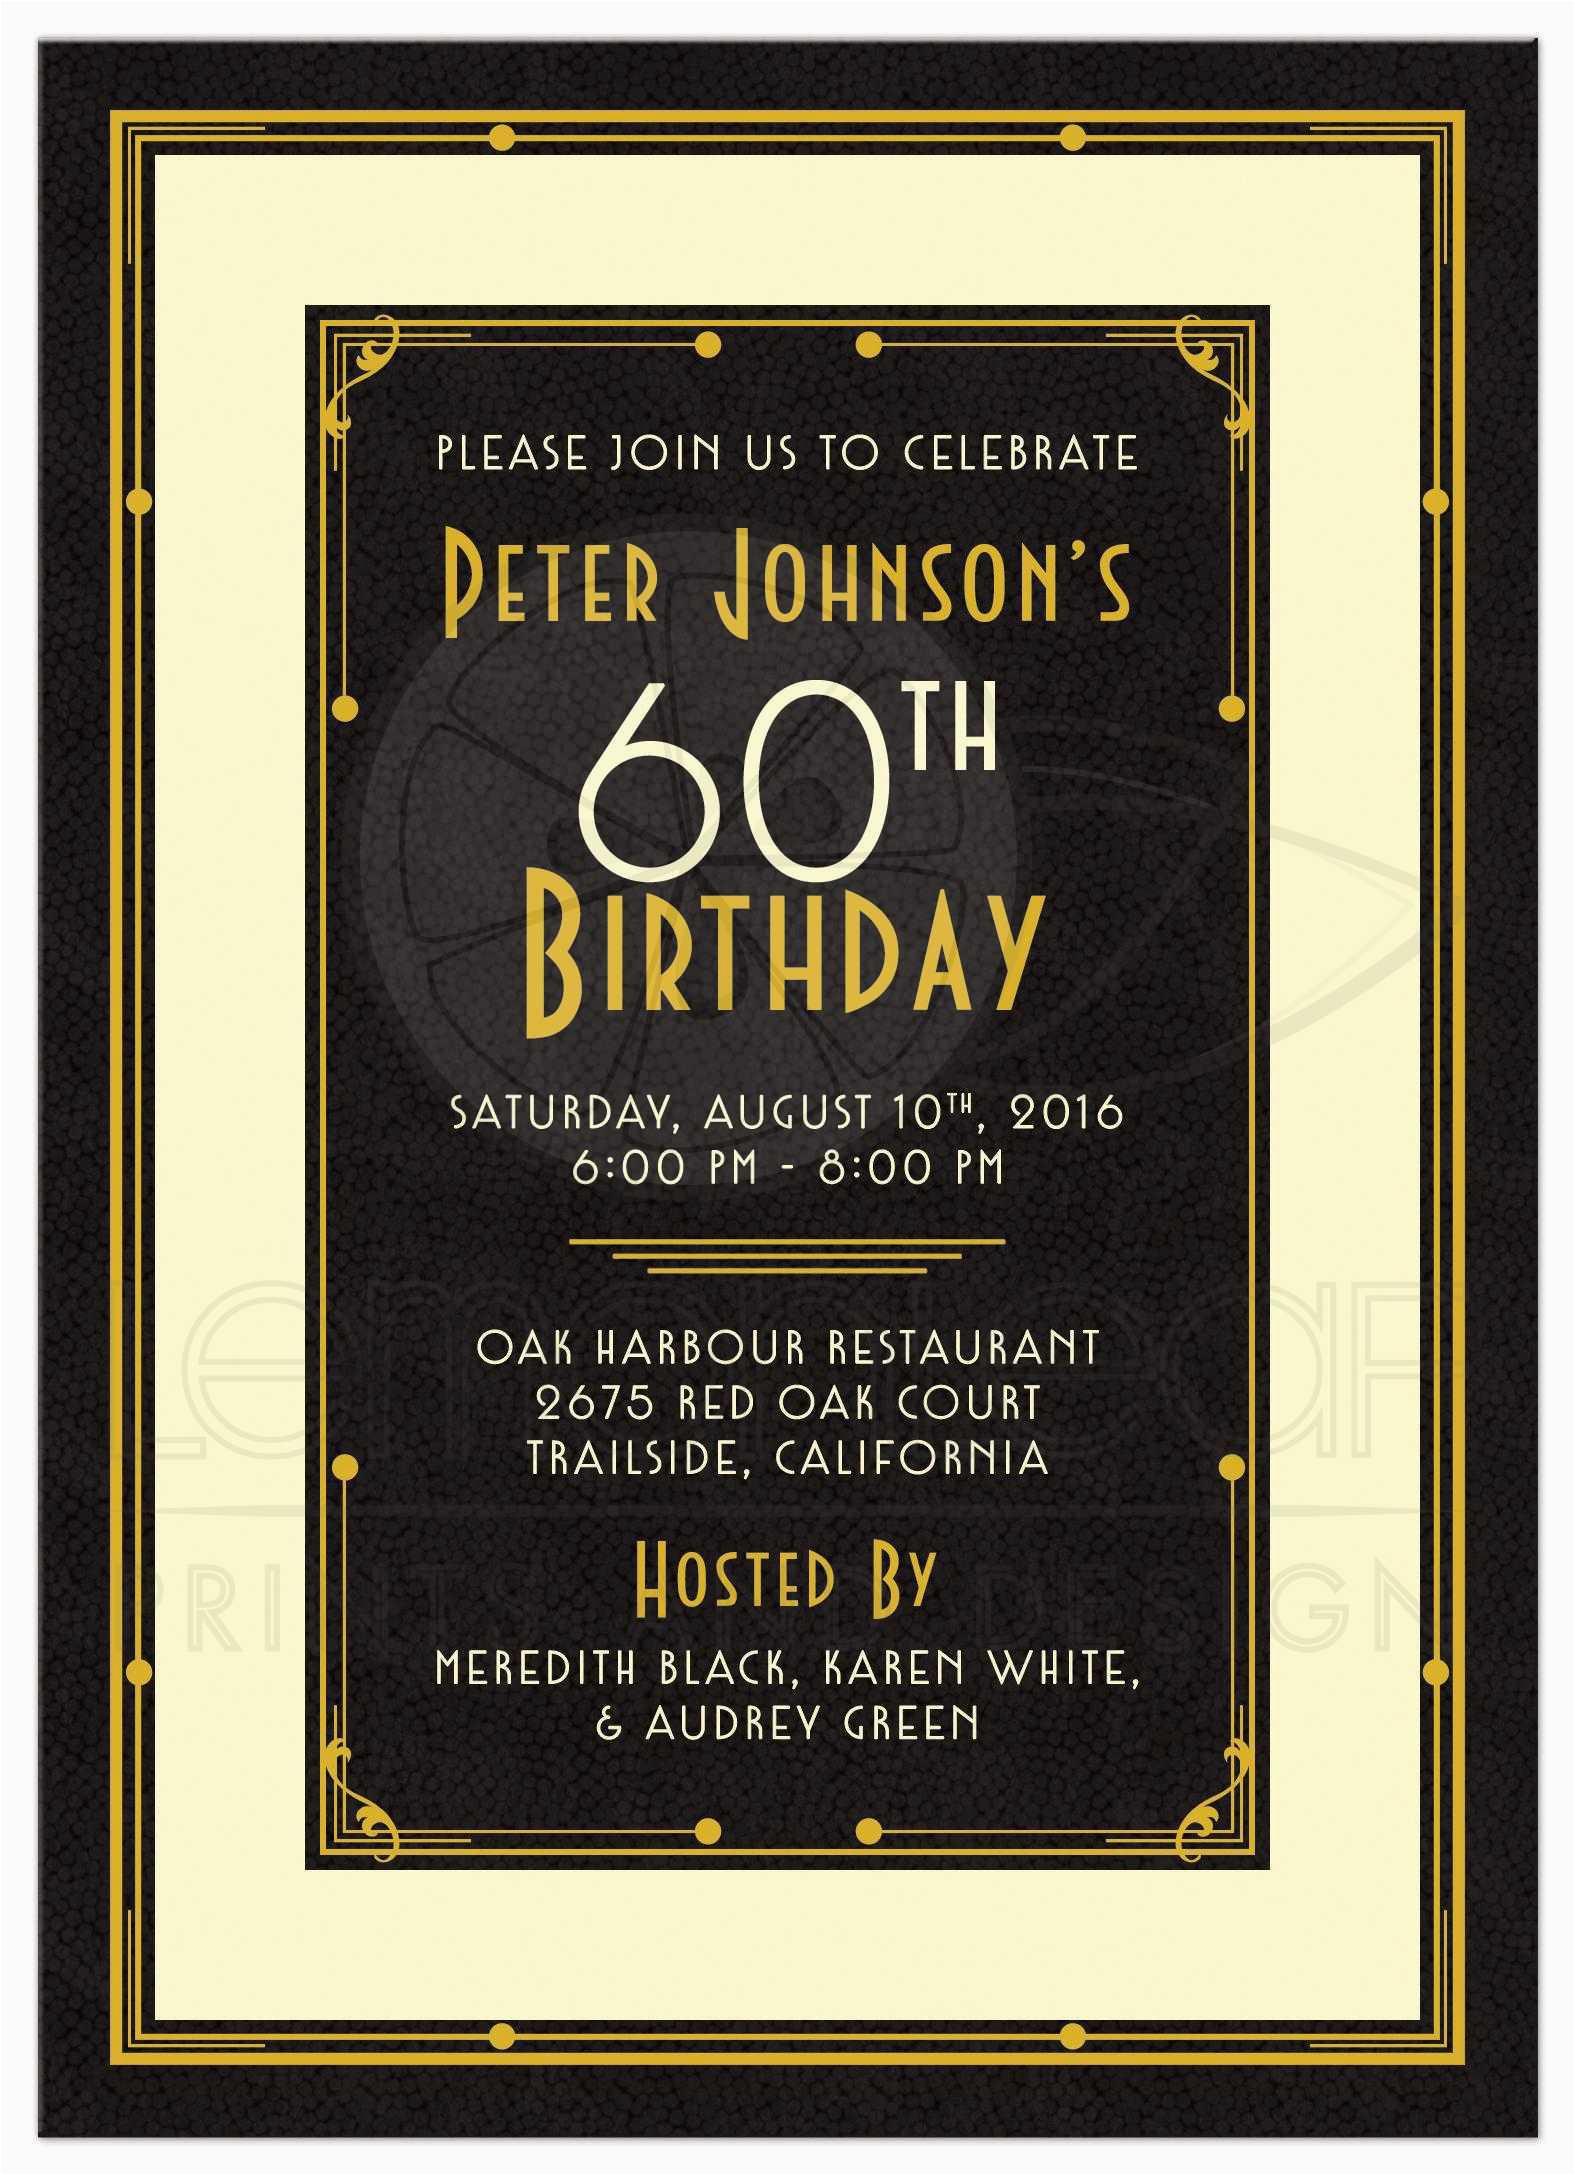 60th Birthday Celebration Invitations Party Templates